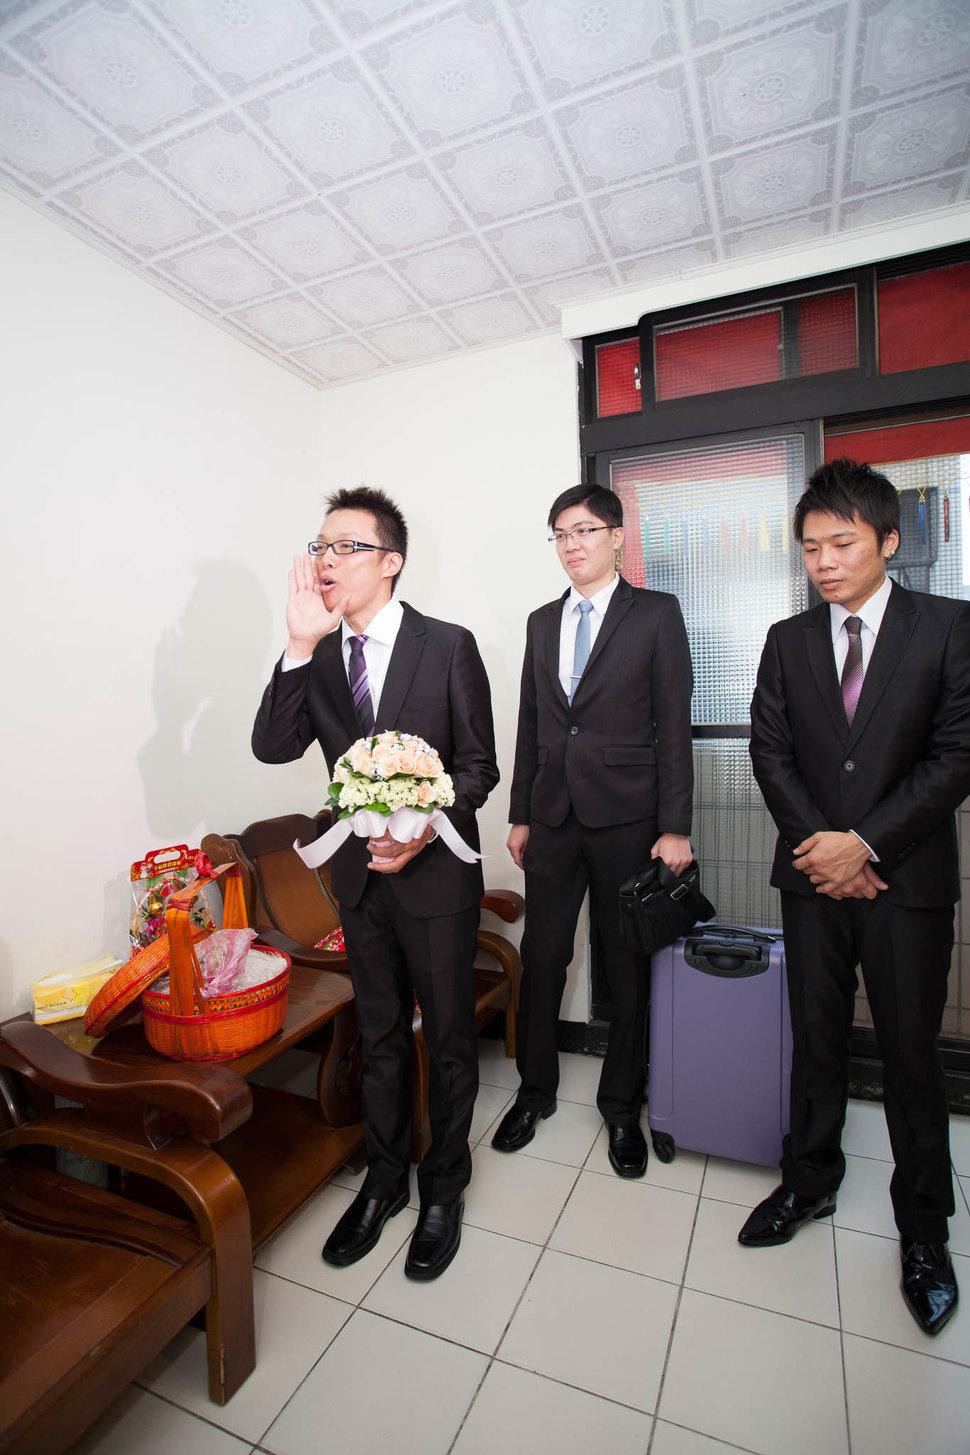 18PHOTO-青蛙王子娶新娘❤️(編號:218617) - 18PHOTO 婚紗影像攝影工作室 - 結婚吧一站式婚禮服務平台